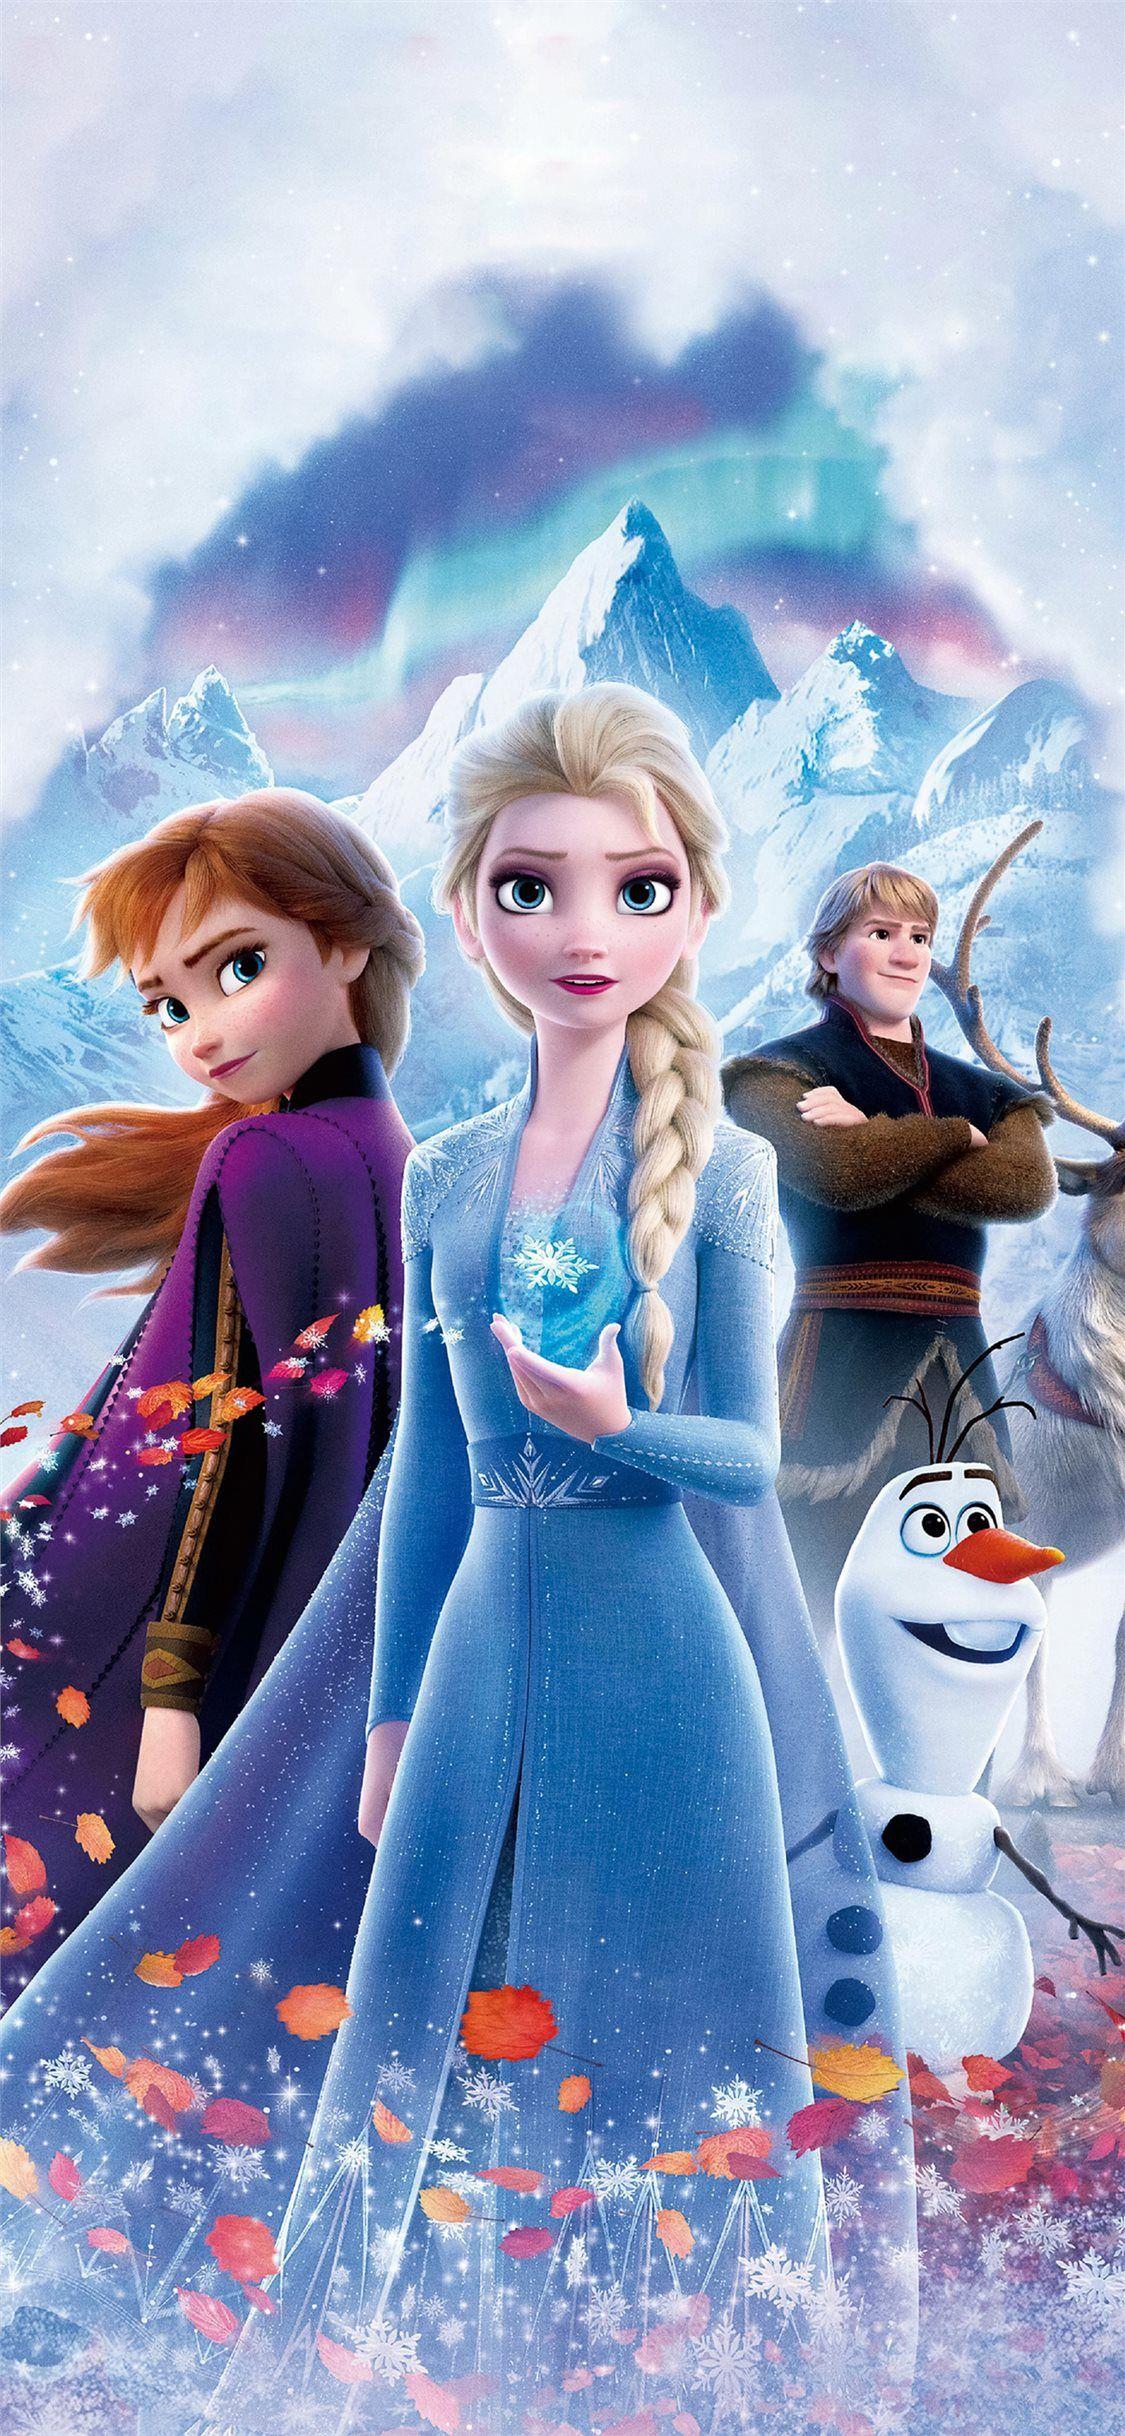 Frozen 2 Poster 4k Frozen Wallpaper Frozen Poster Frozen Disney Movie